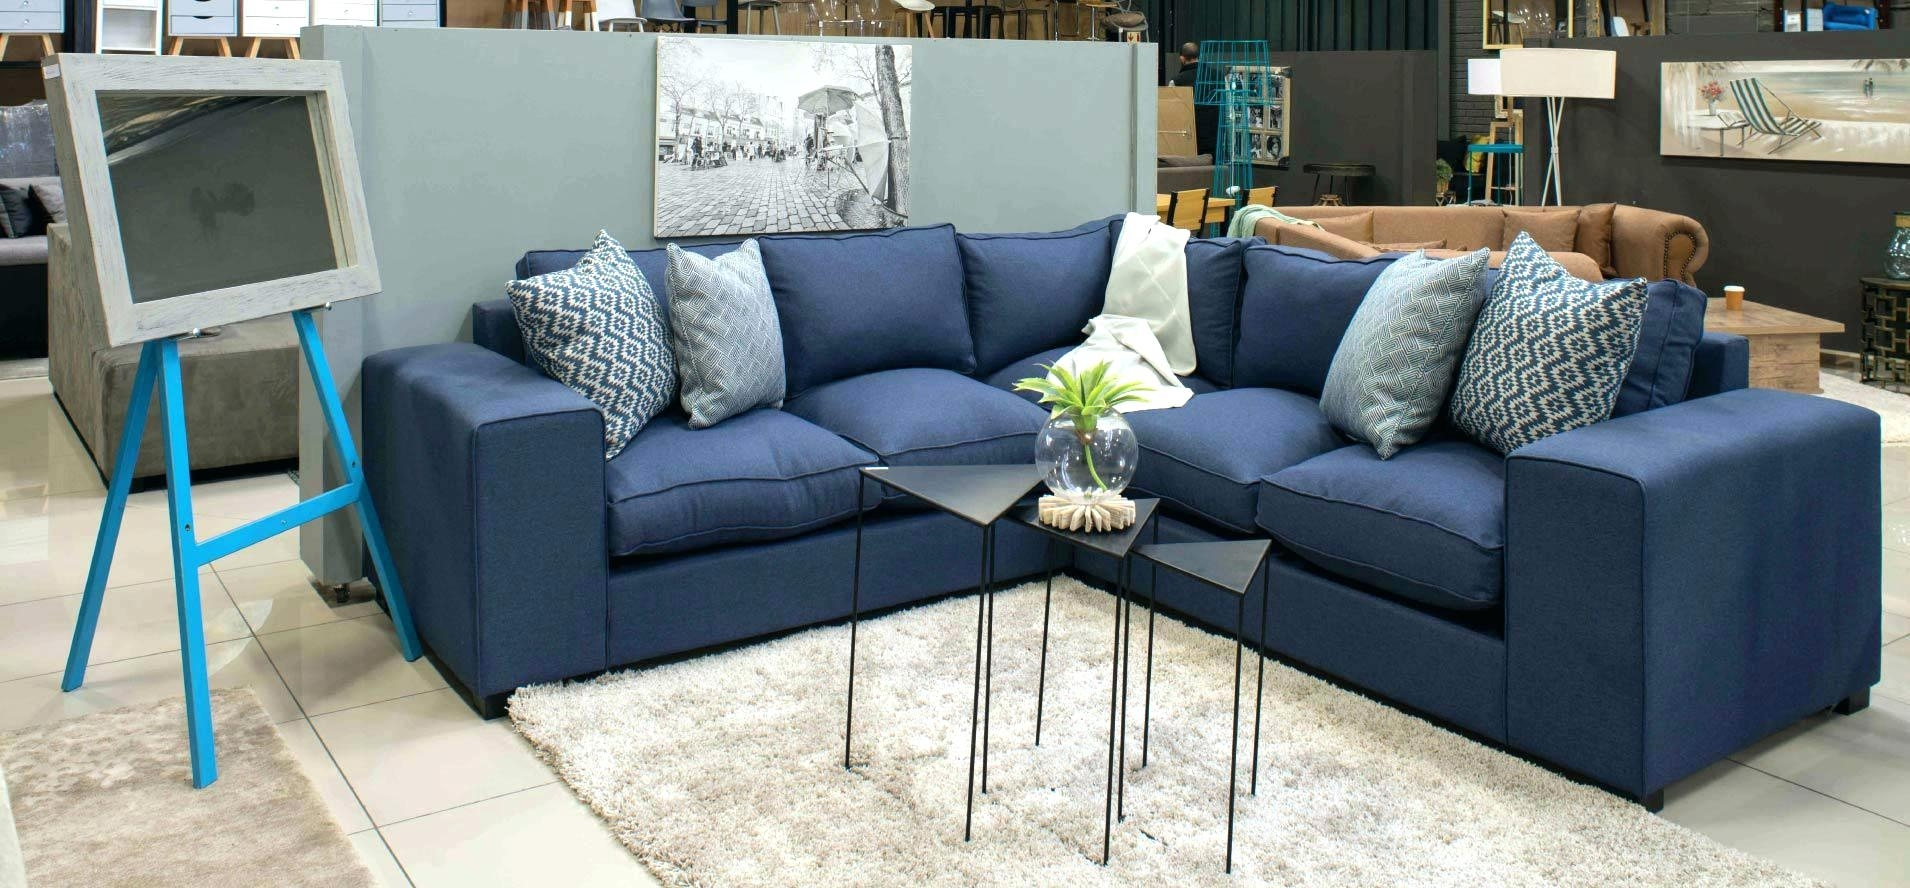 swivel chair nigeria wayfair lounge chairs outdoor 10 photos houston sectional sofas sofa ideas